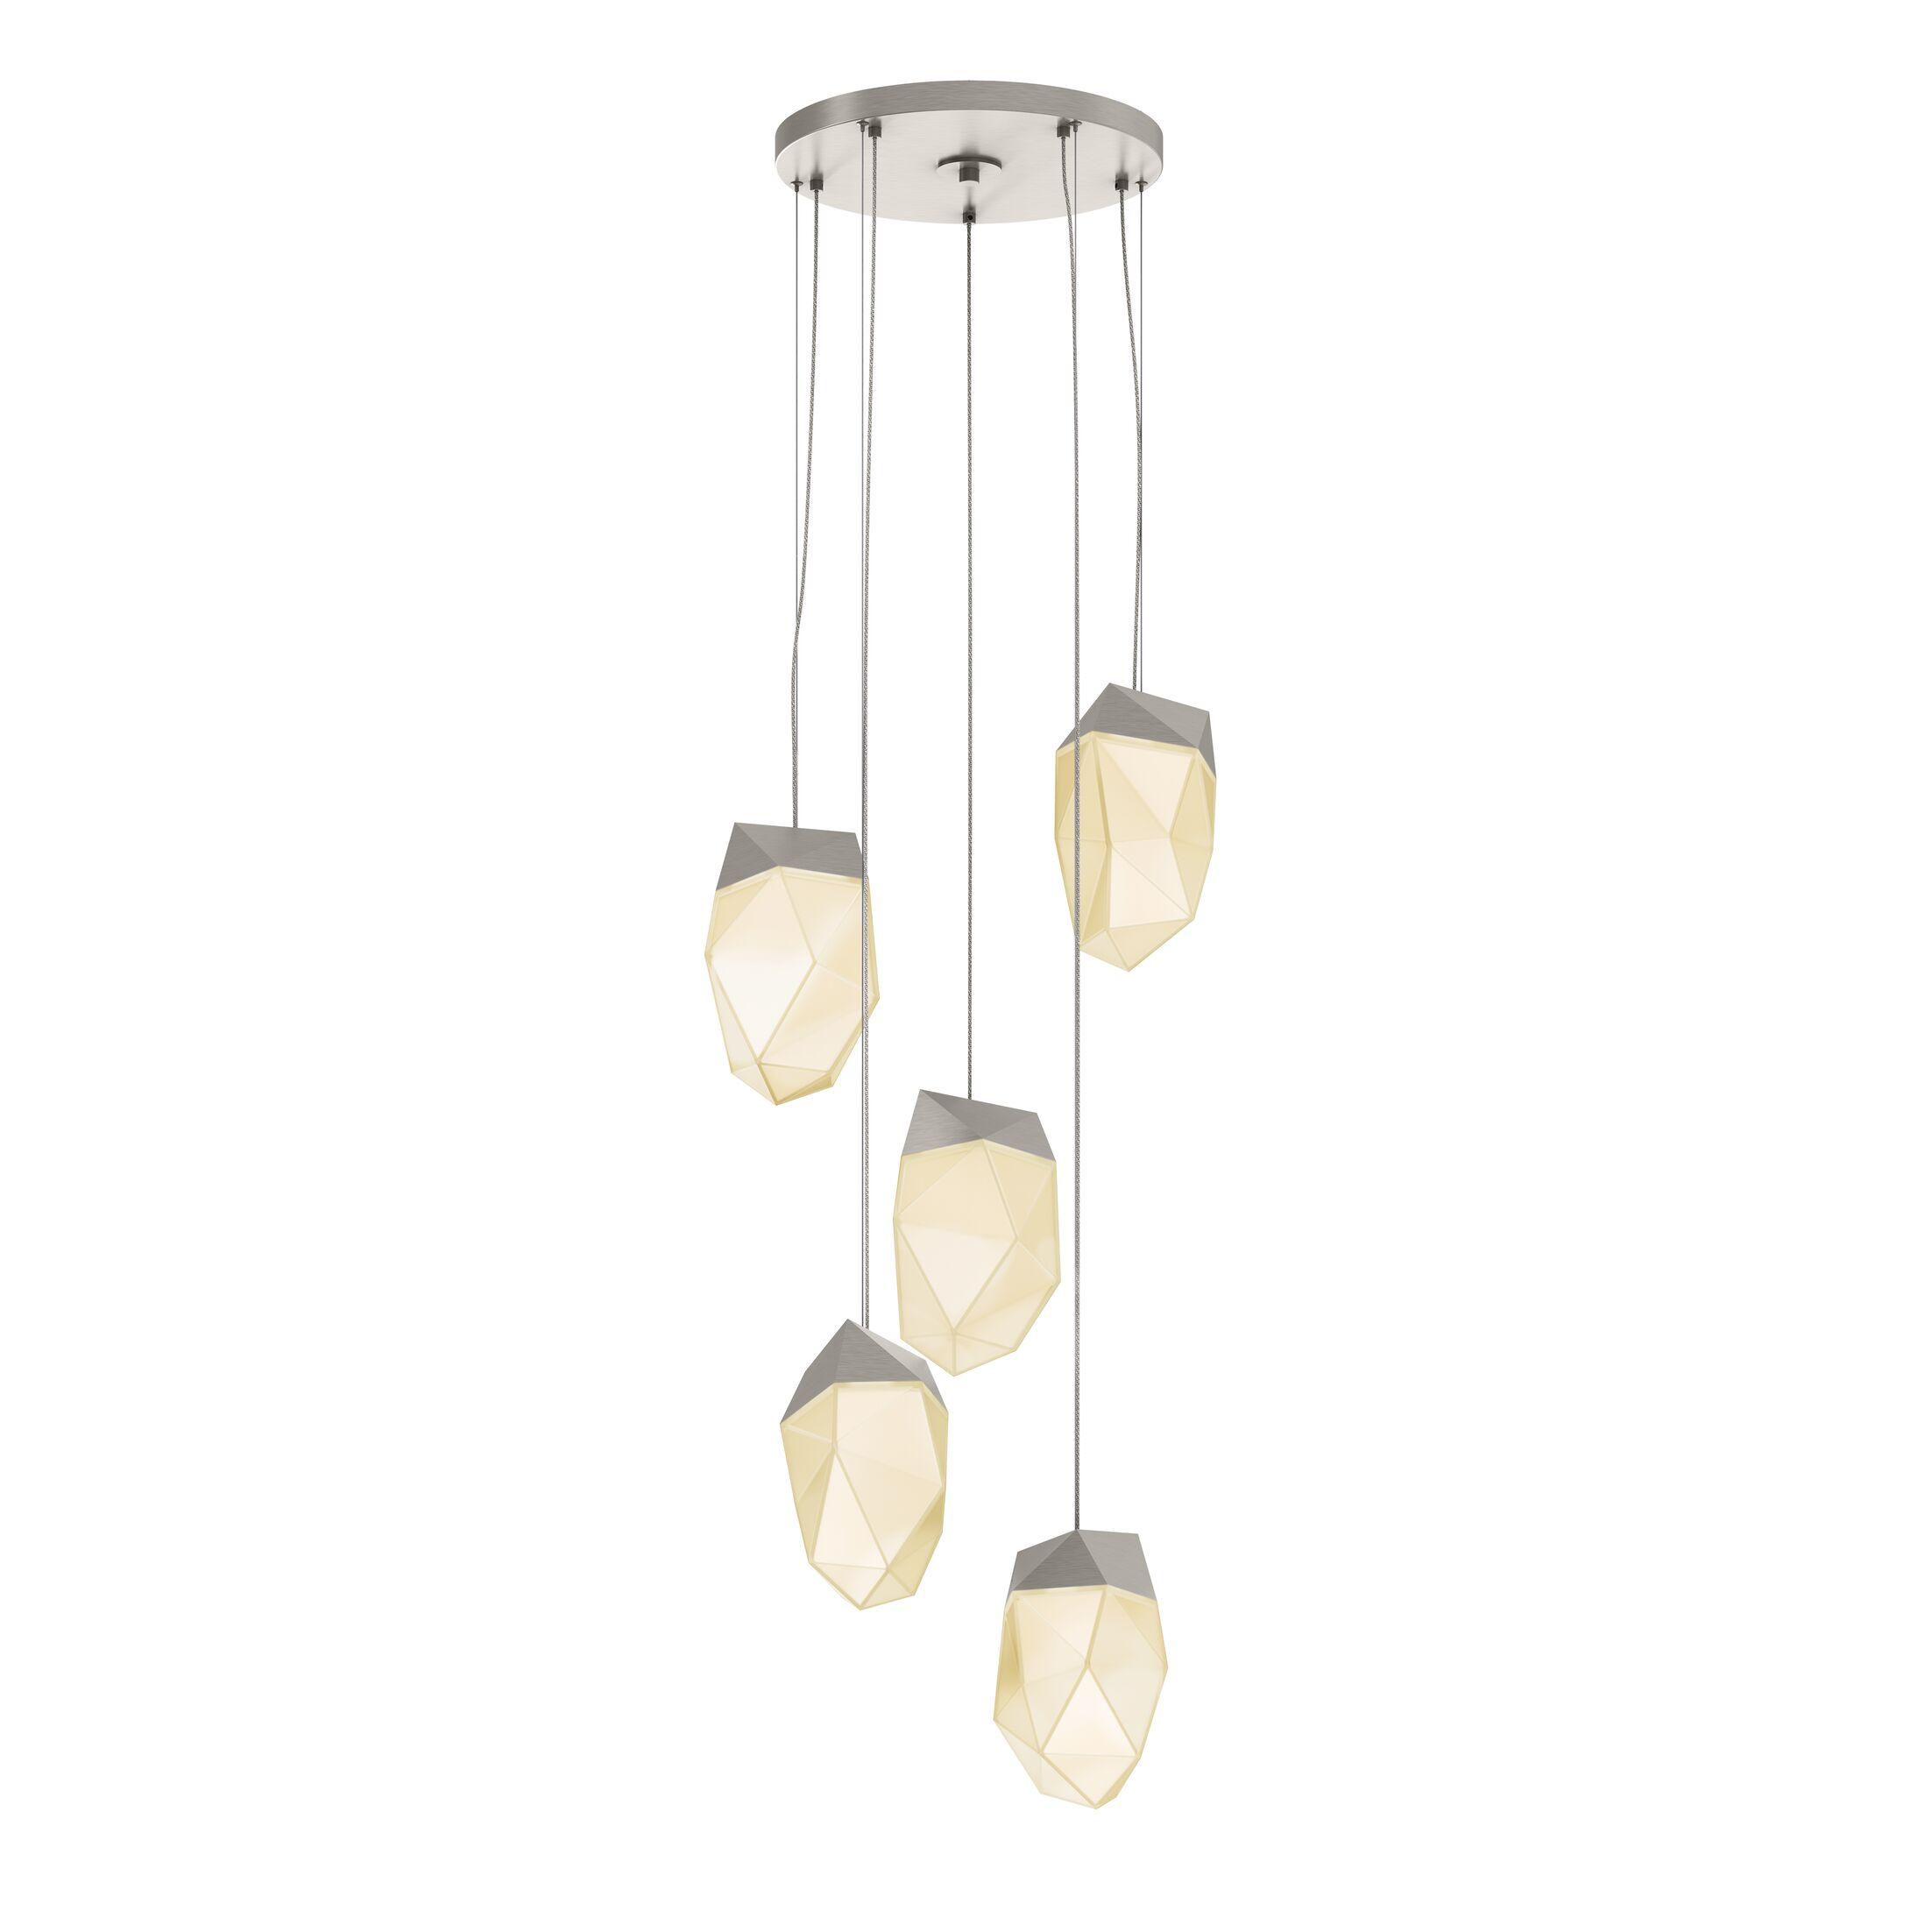 5-Light  LED  Pendant Finish: Satin Nickel